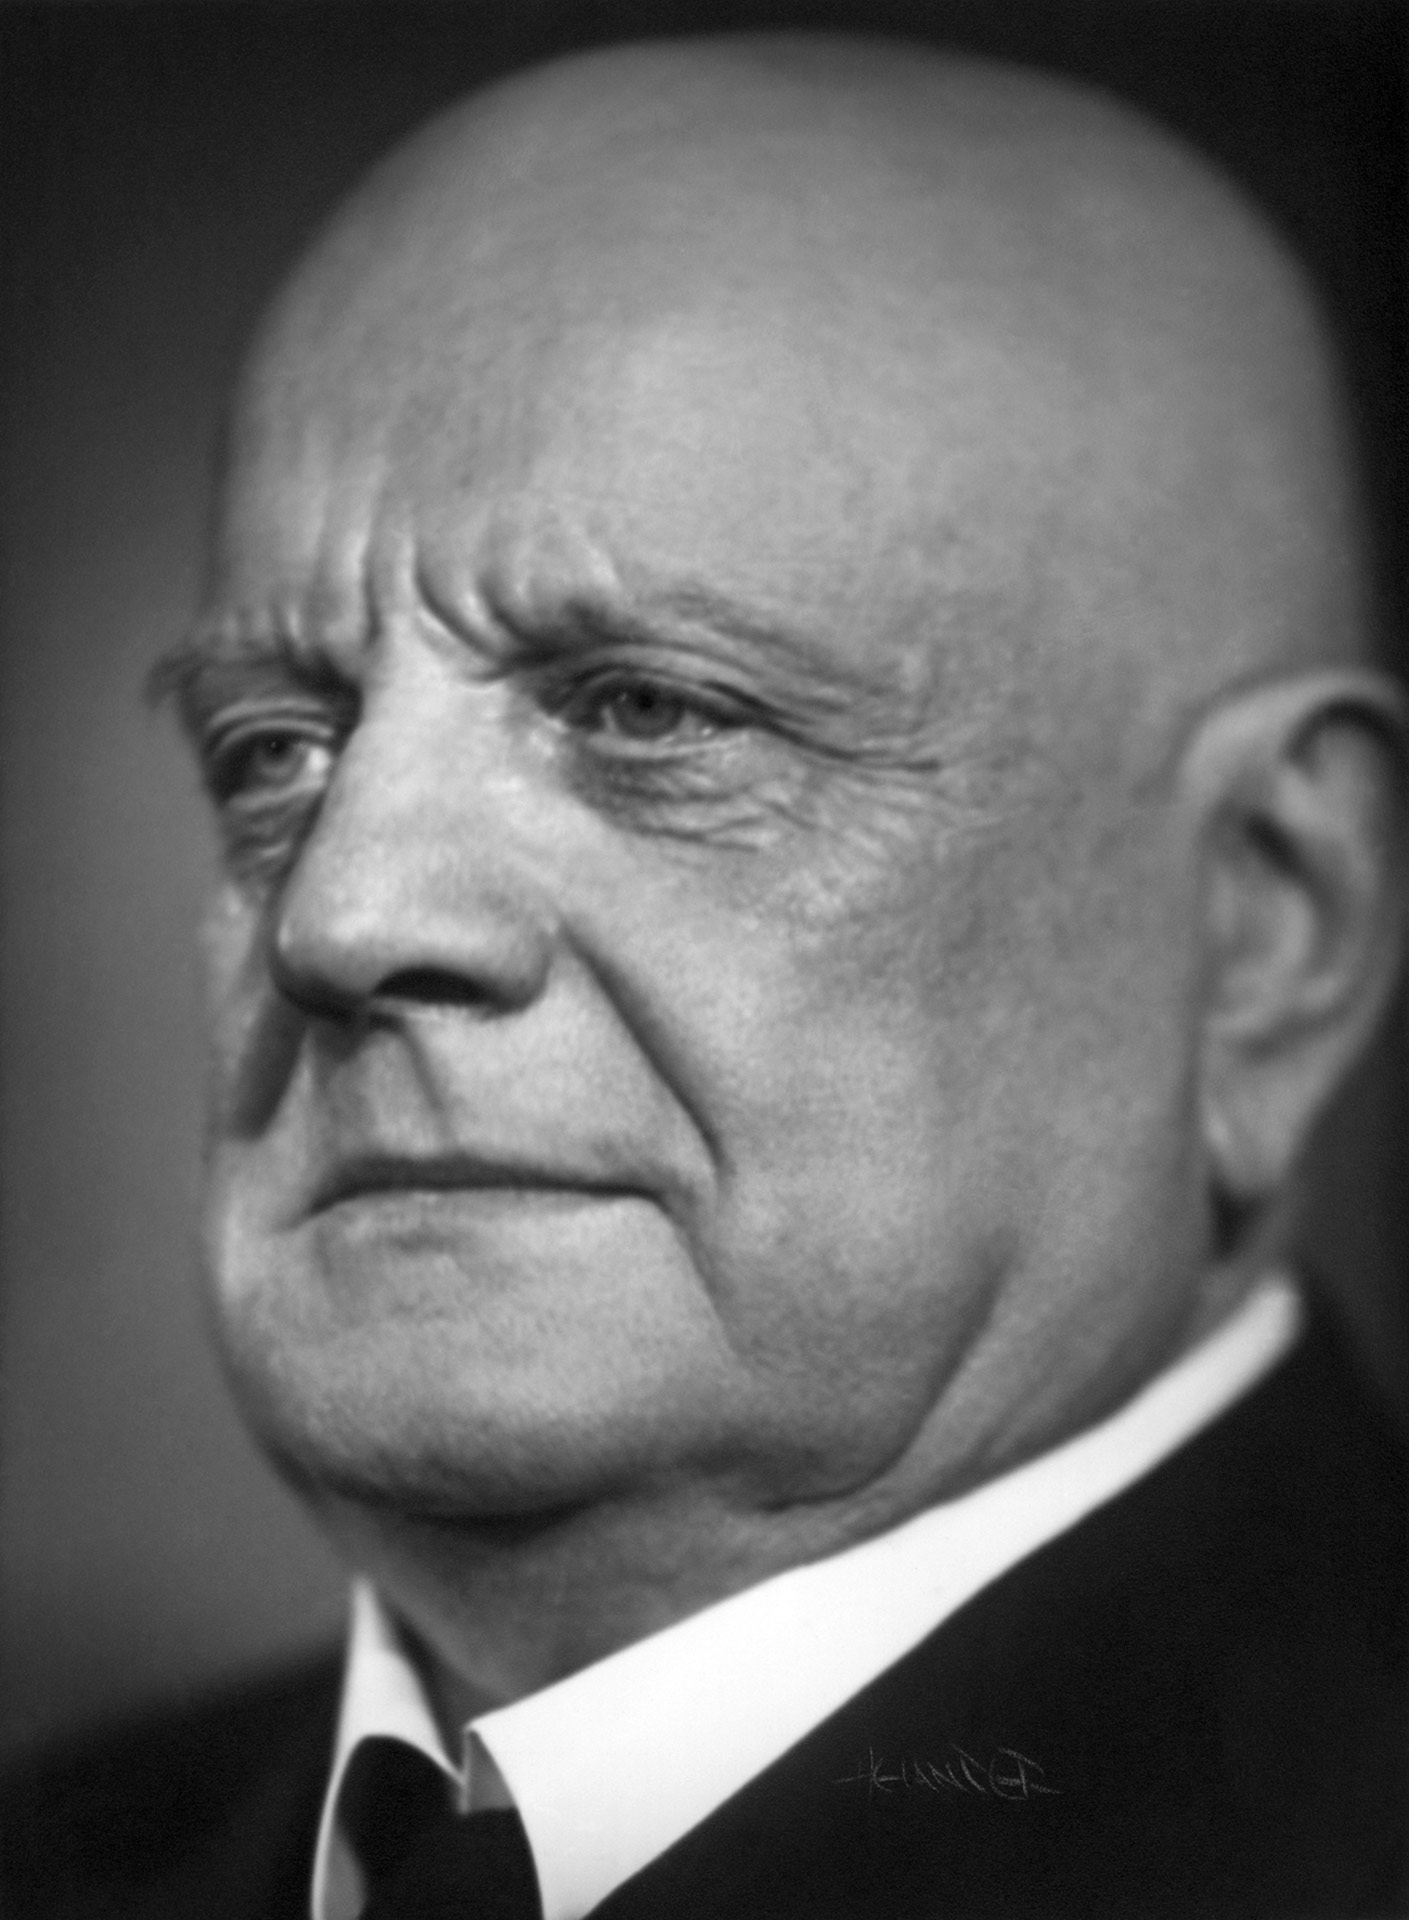 Sibelius in 1940